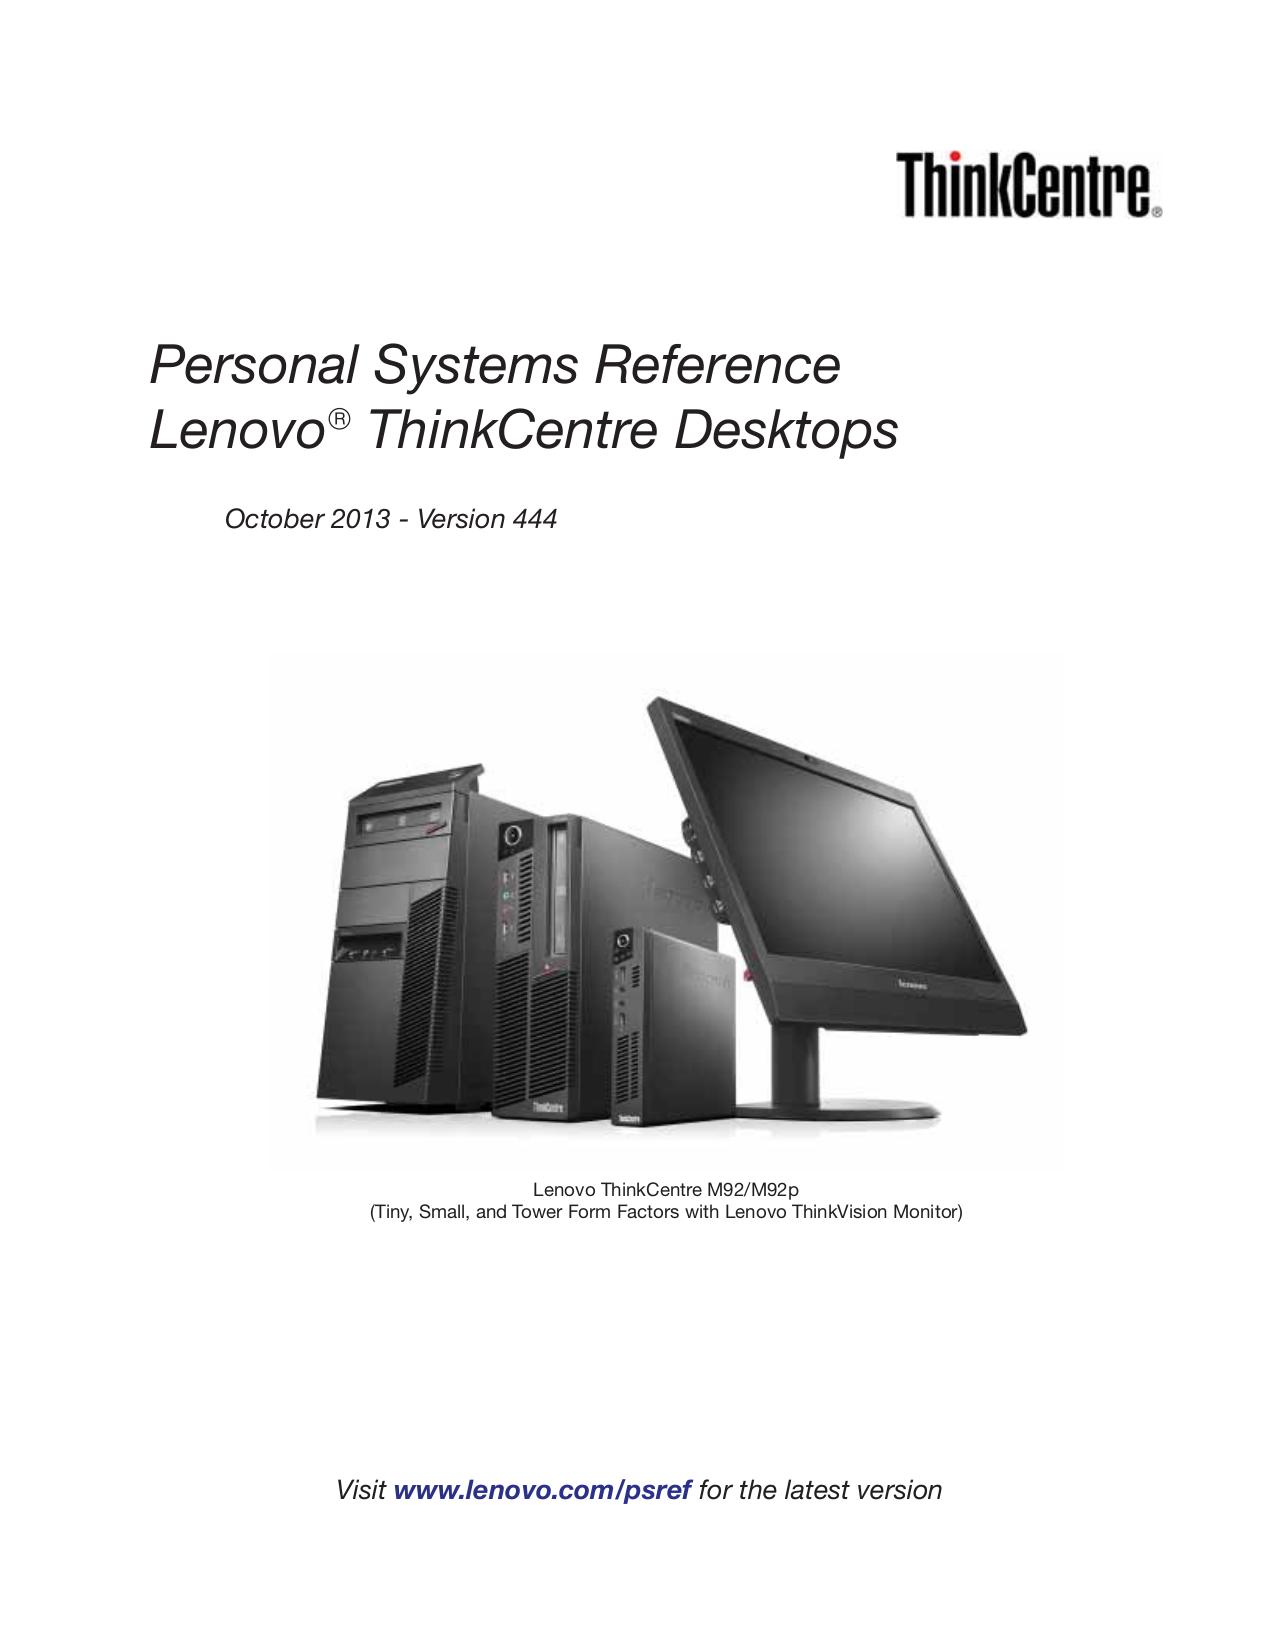 pdf for Lenovo Desktop ThinkCentre M58 7637 manual